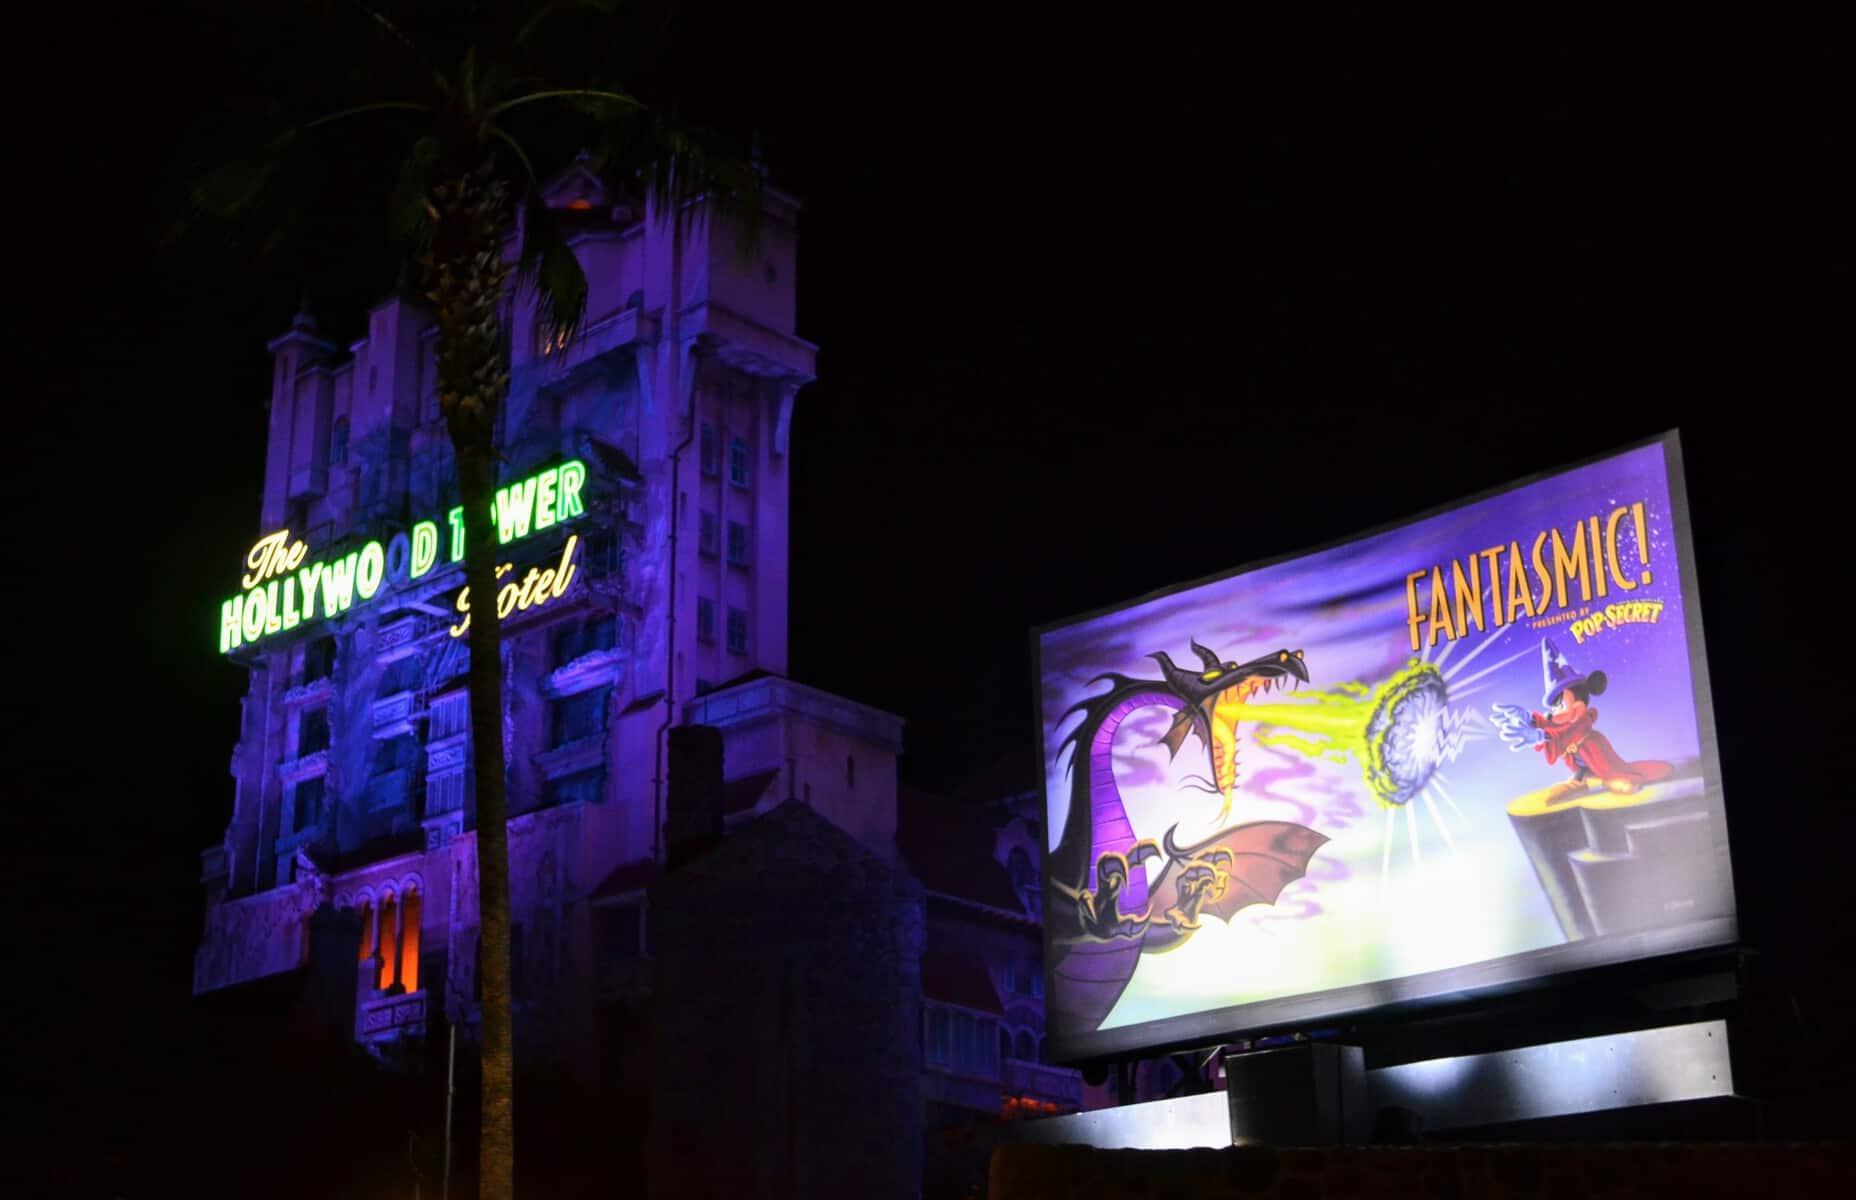 Fantasmic at Disney's Hollywood Studios